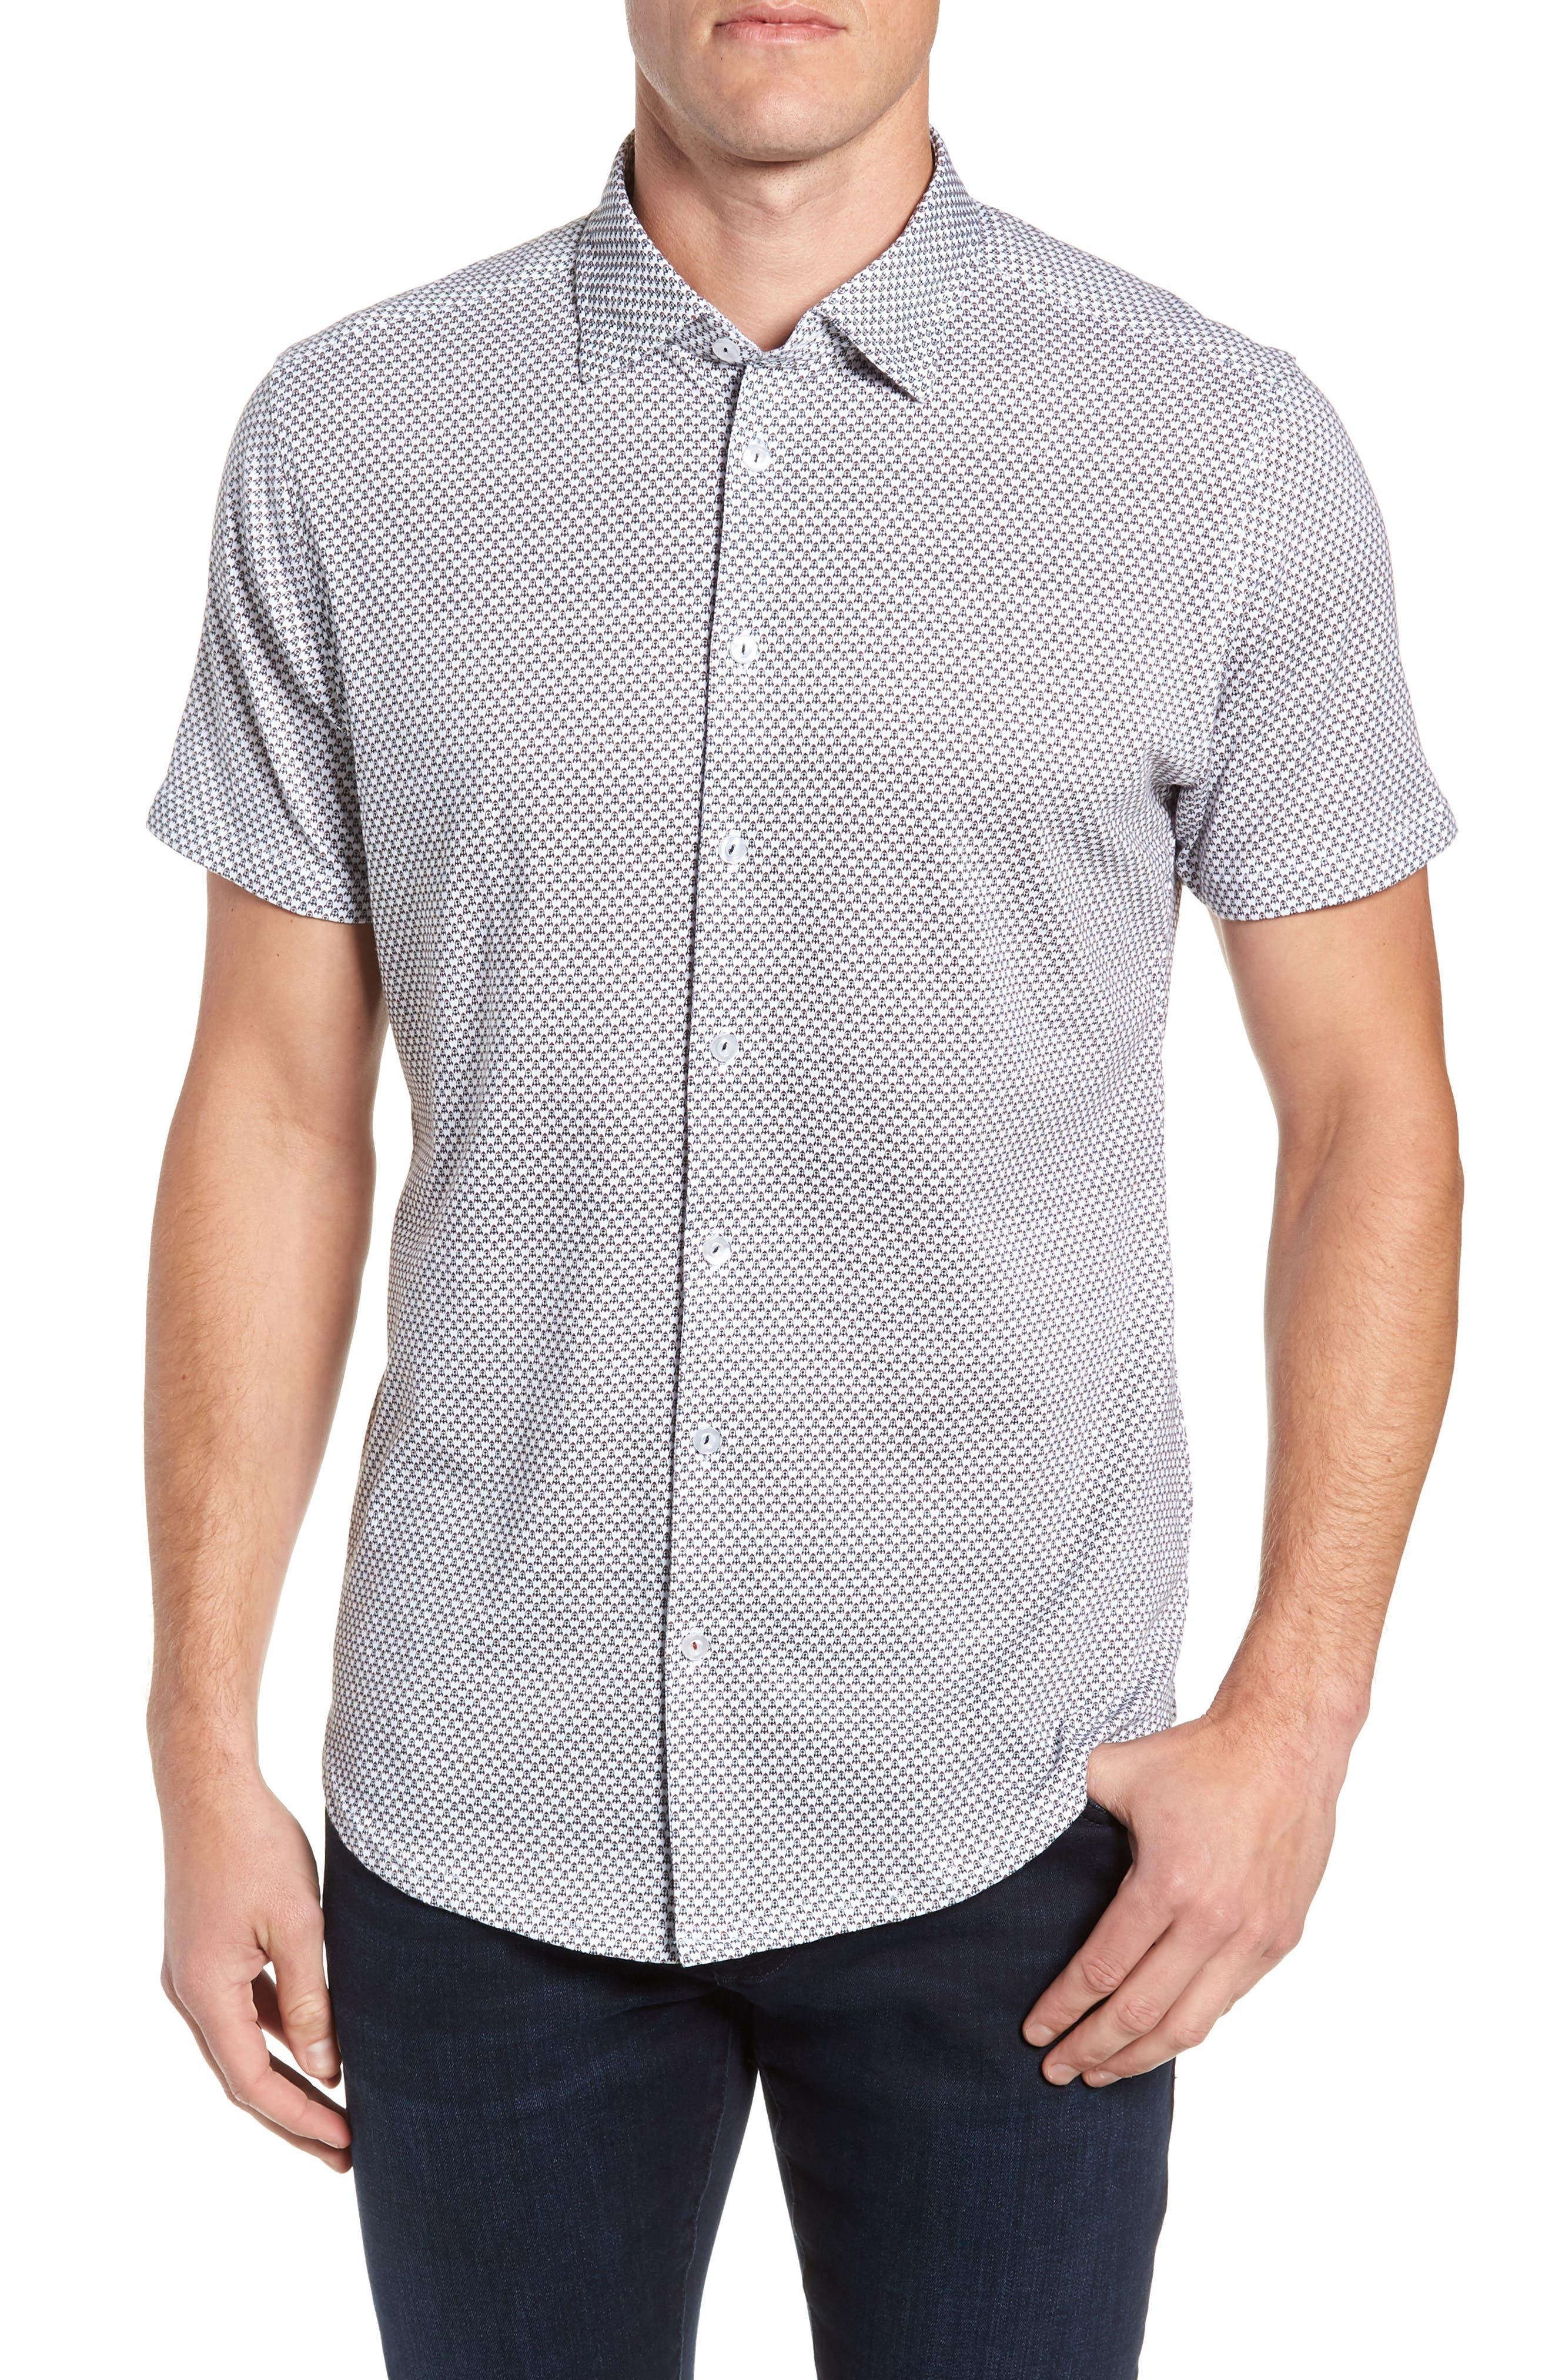 Regular Fit Sport Shirt,                             Main thumbnail 1, color,                             WHITE